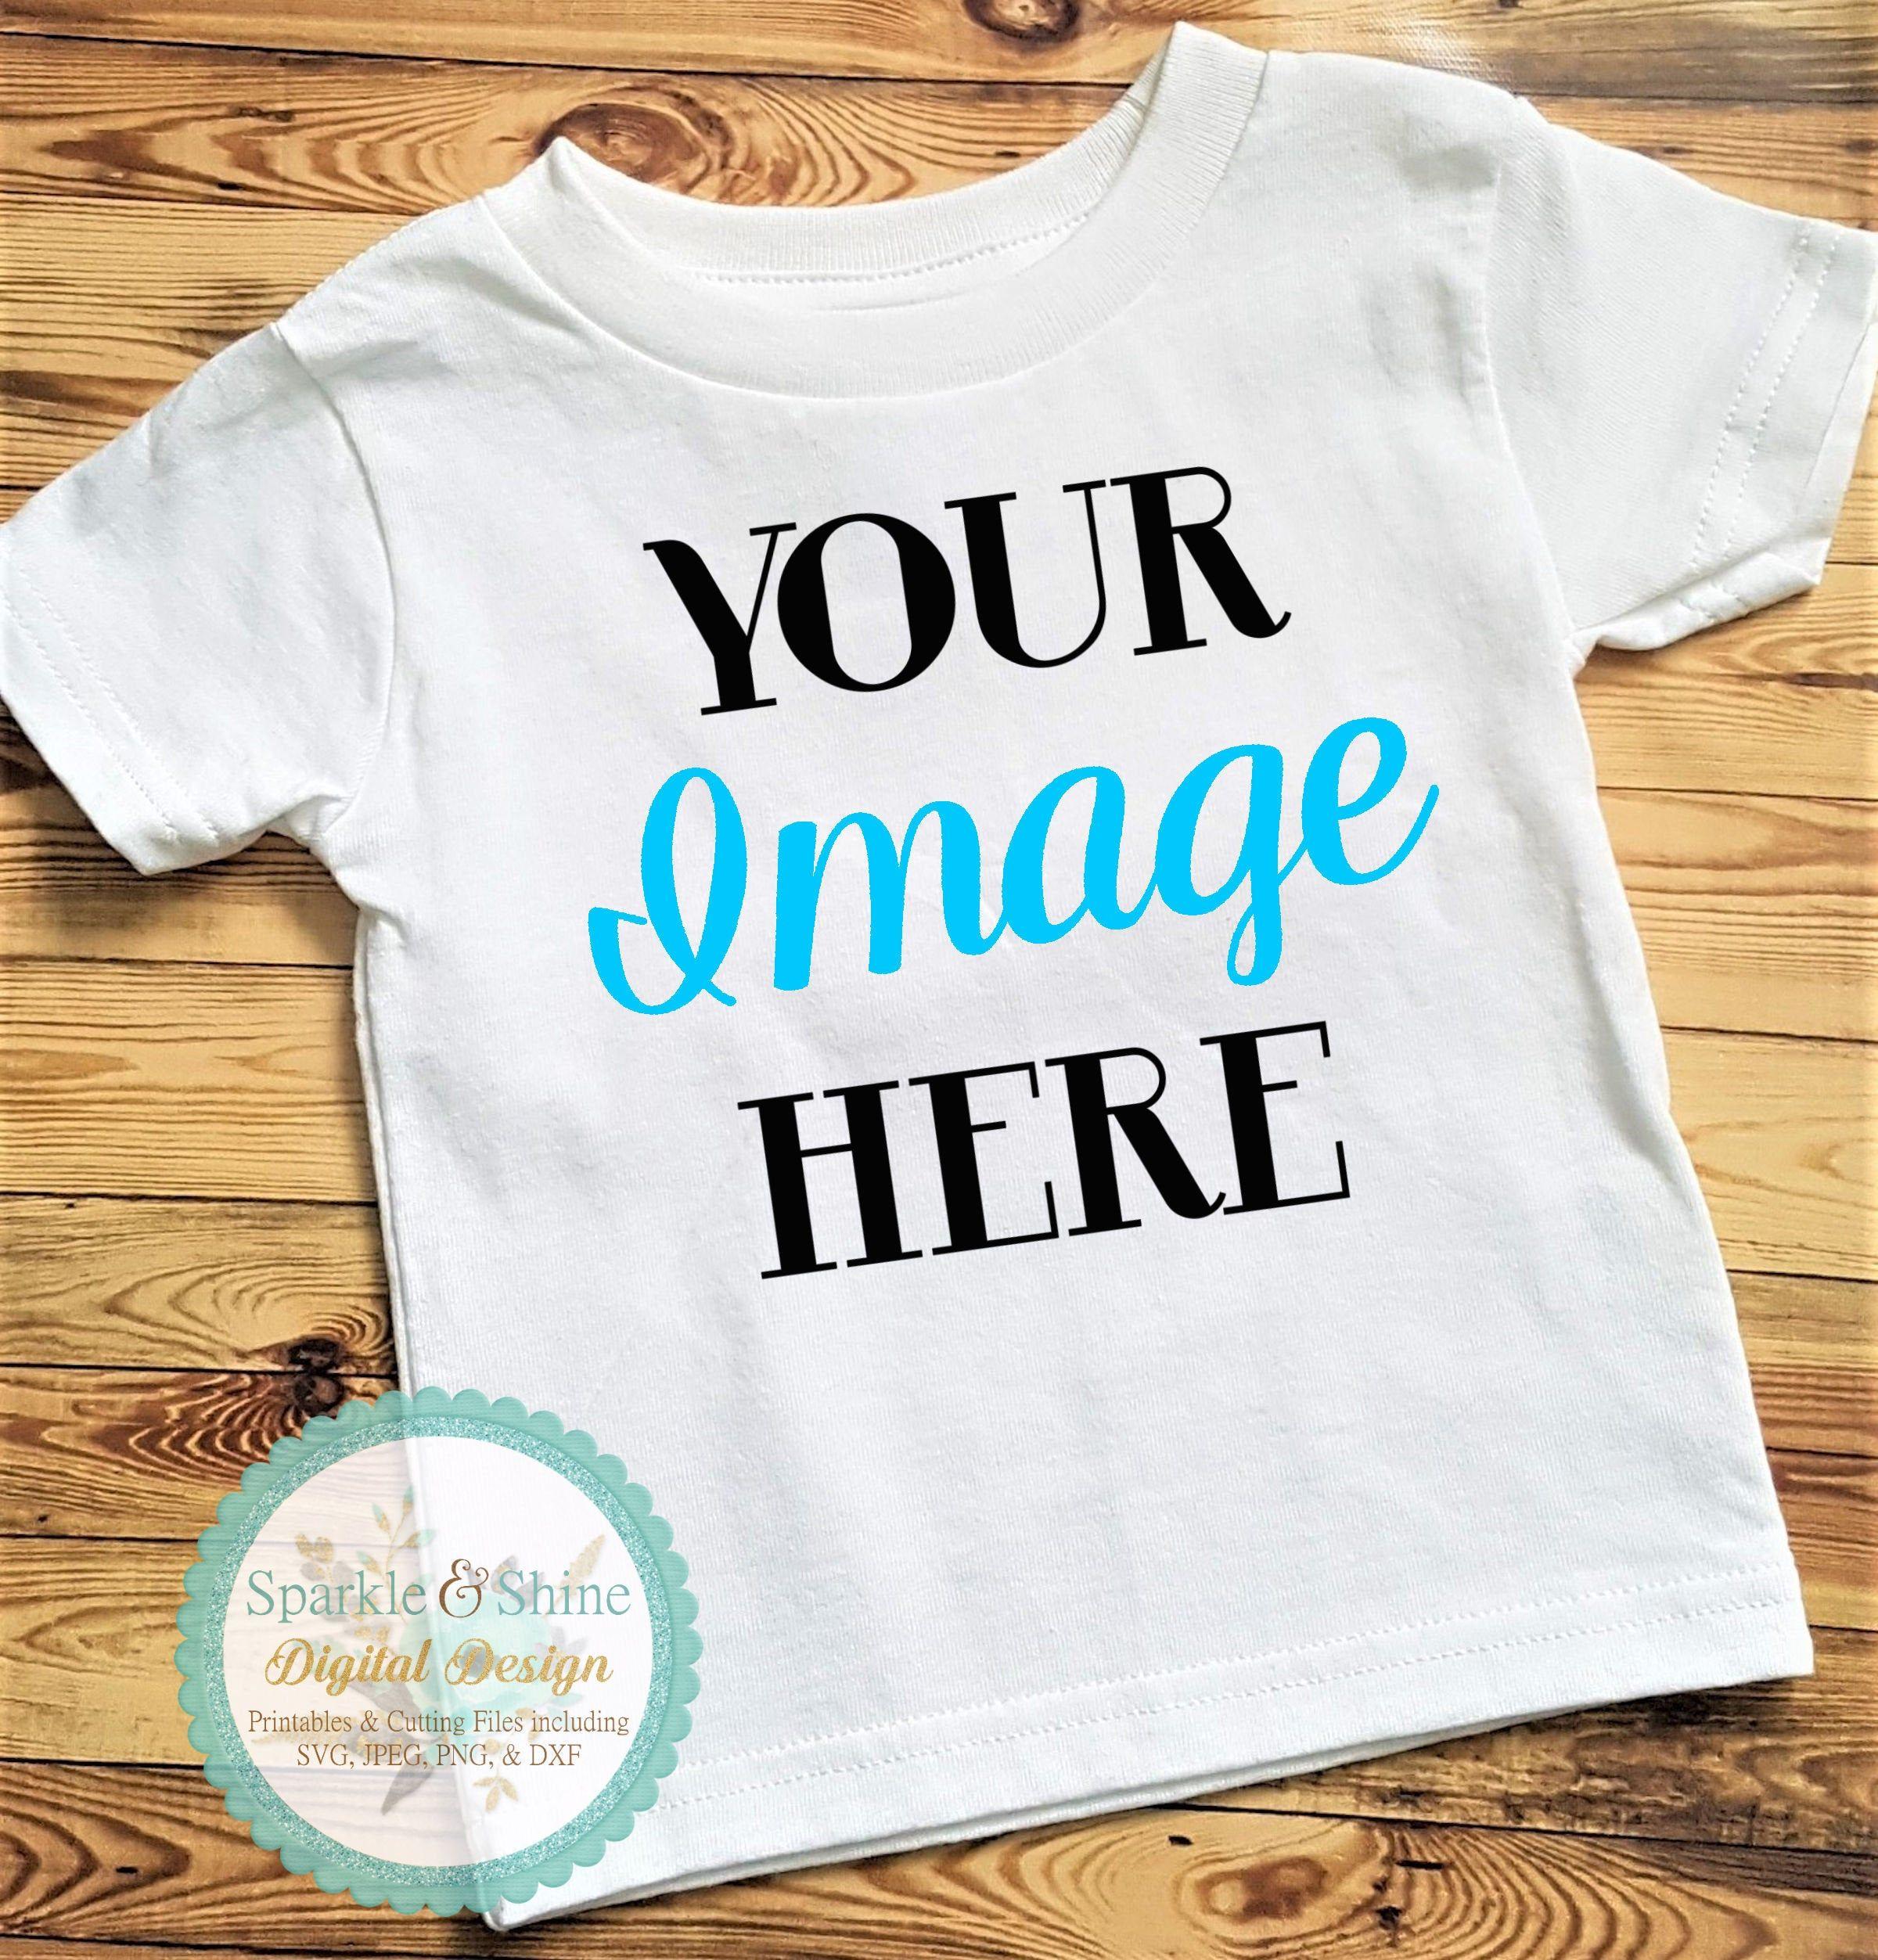 Download Download Free White Blank Toddler Tee Mockup Image Wood Background Psd Free Psd Mockups Templates Mockup Free Psd Shirt Mockup Clothing Mockup